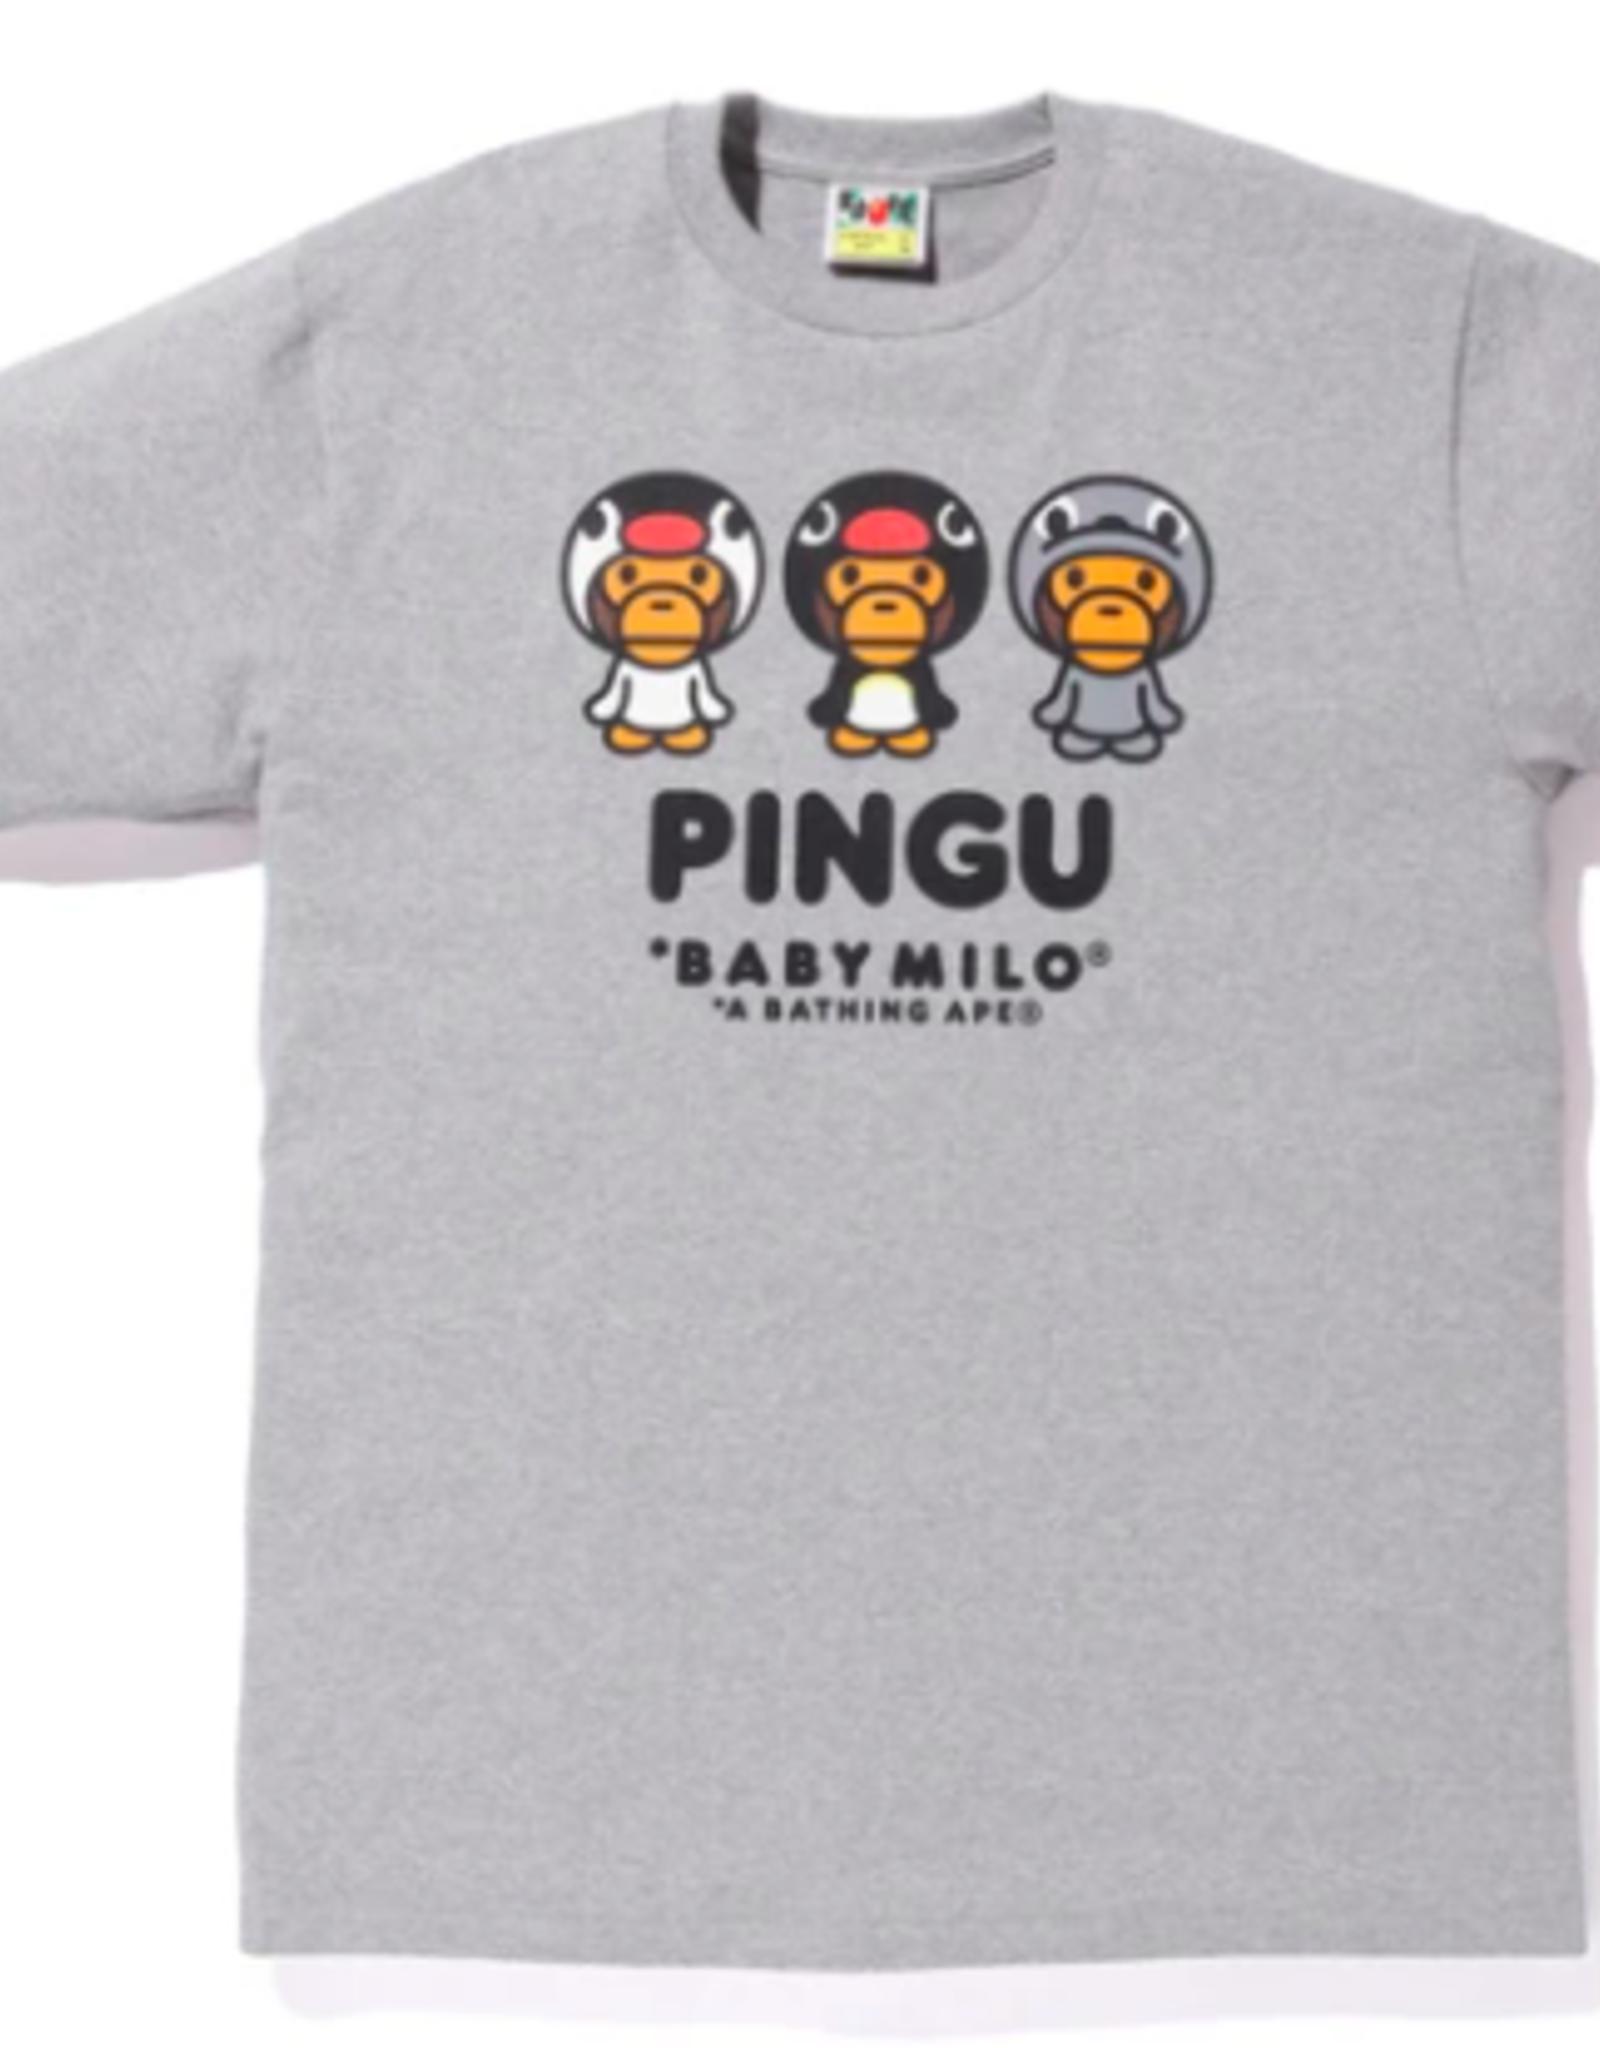 BAPE BABY MILO X PINGU #B TEE